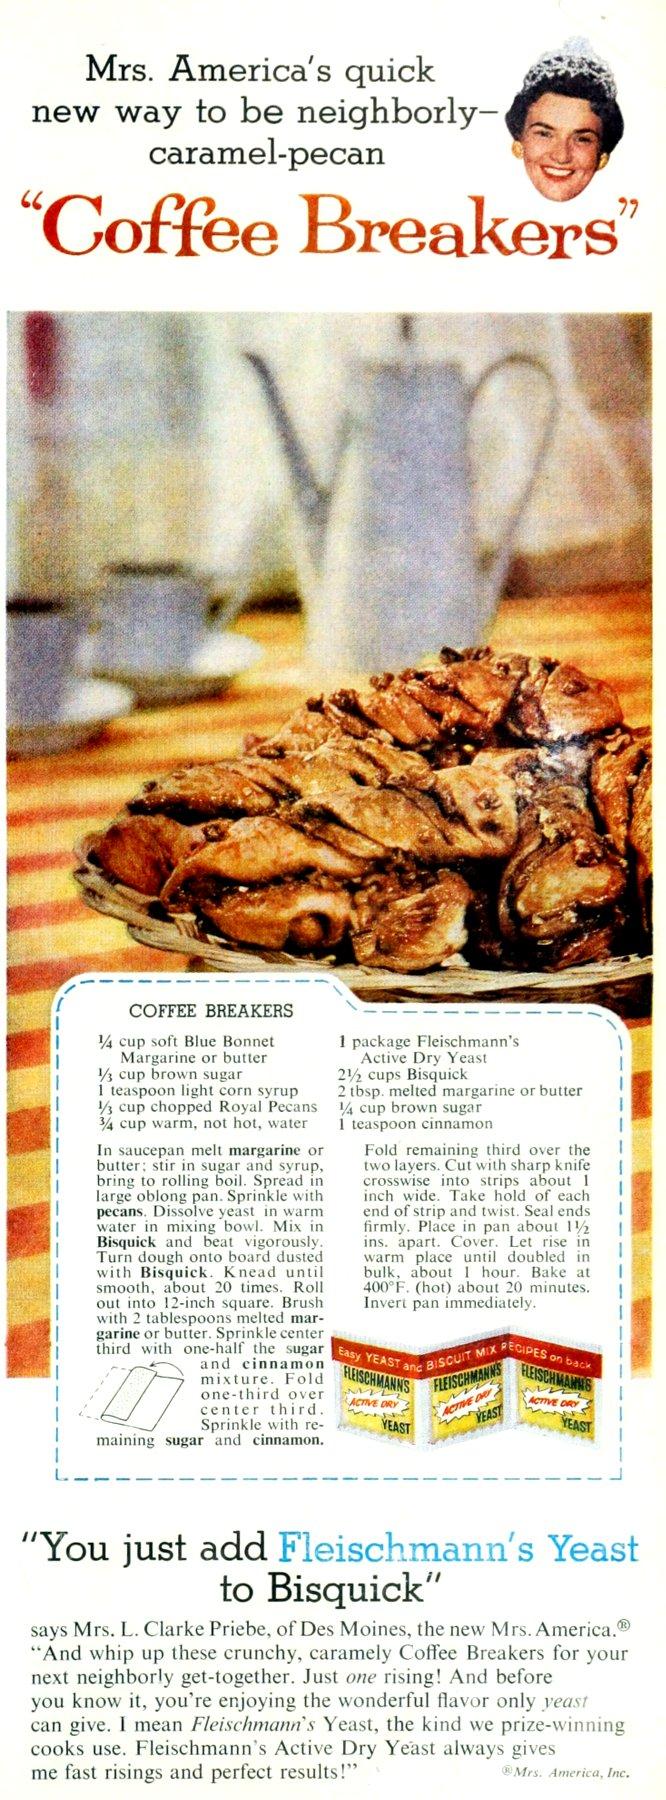 Caramel-pecan cinnamon twist coffee breakers